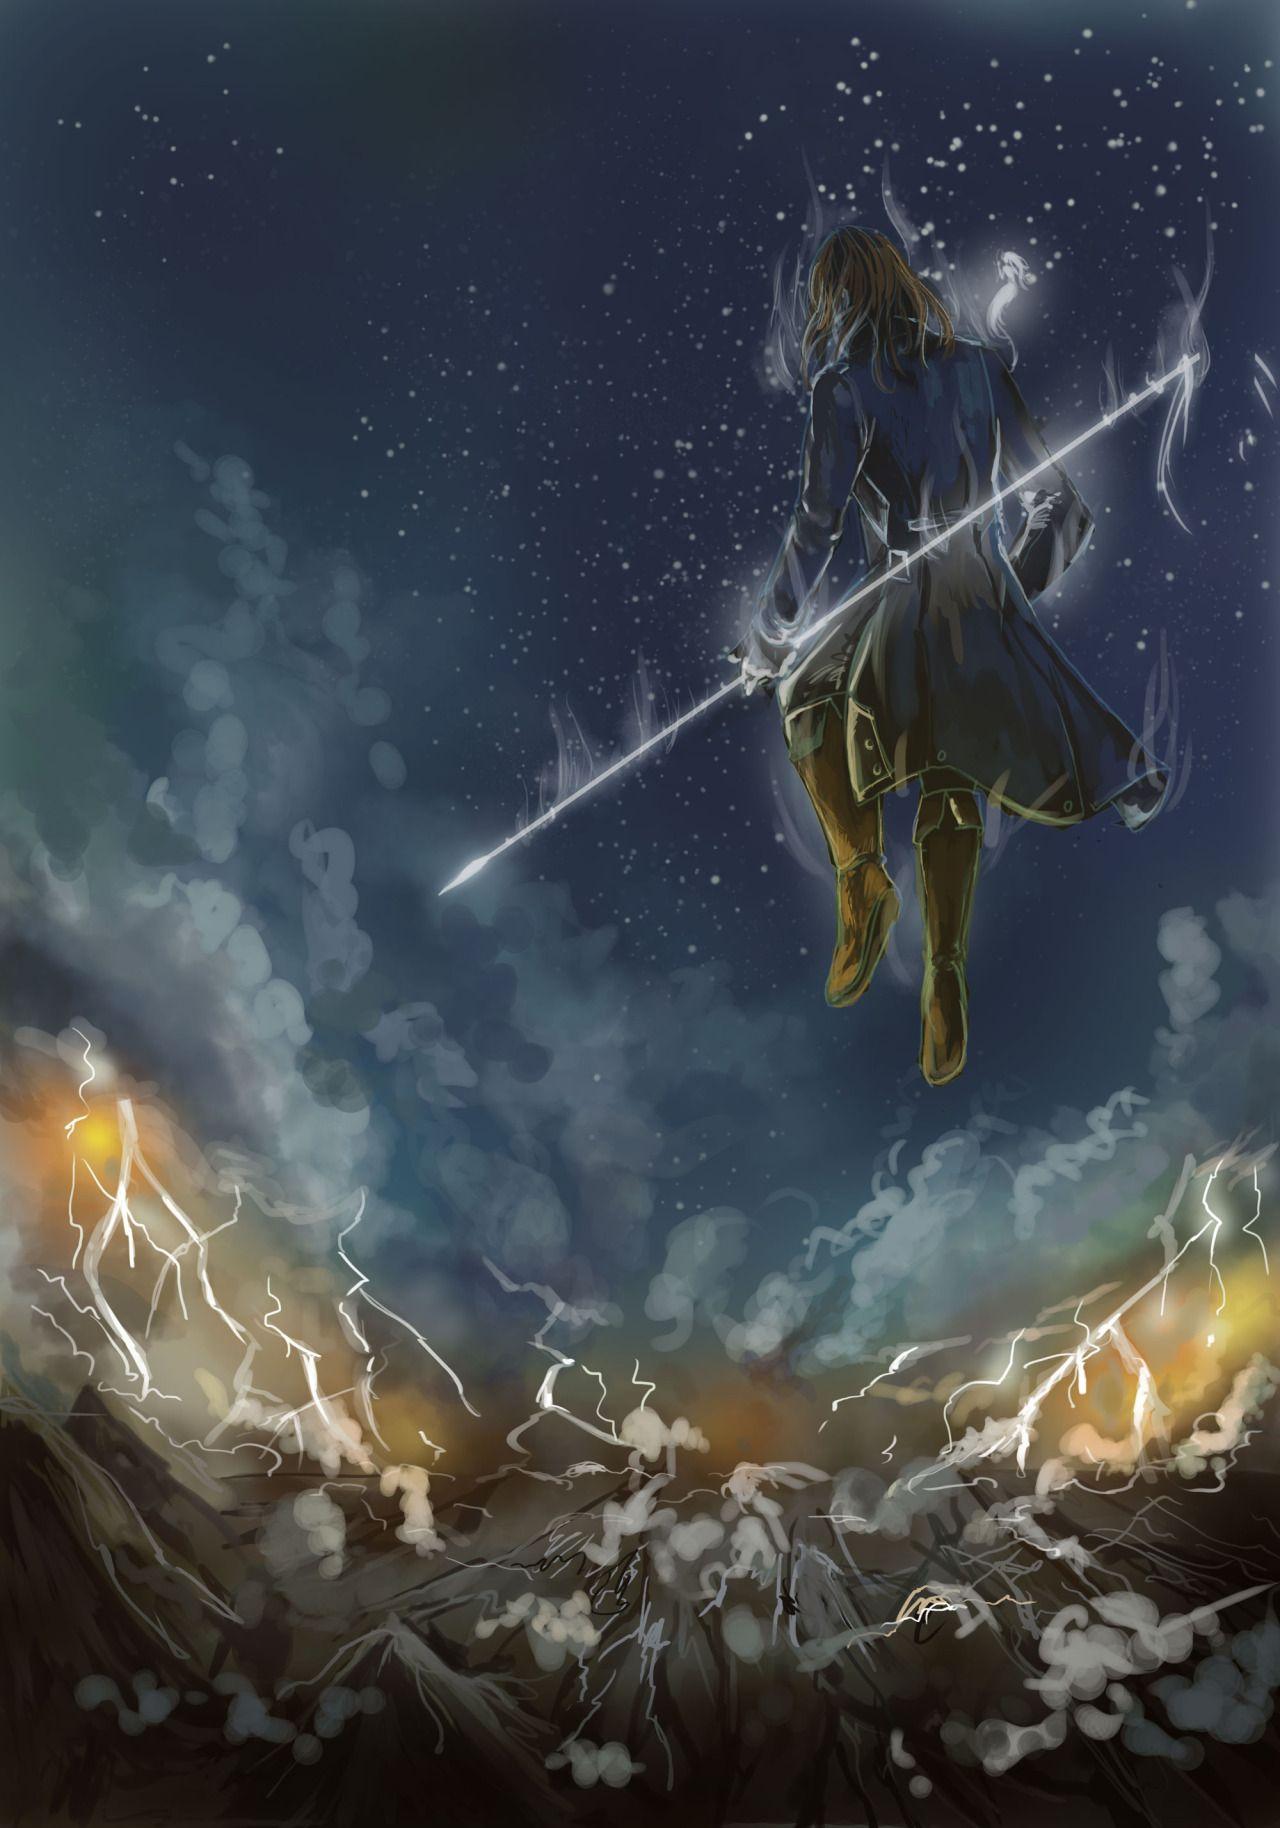 fyldc: Kaladin fron the Stormlight Archive by Brandon Sanderson